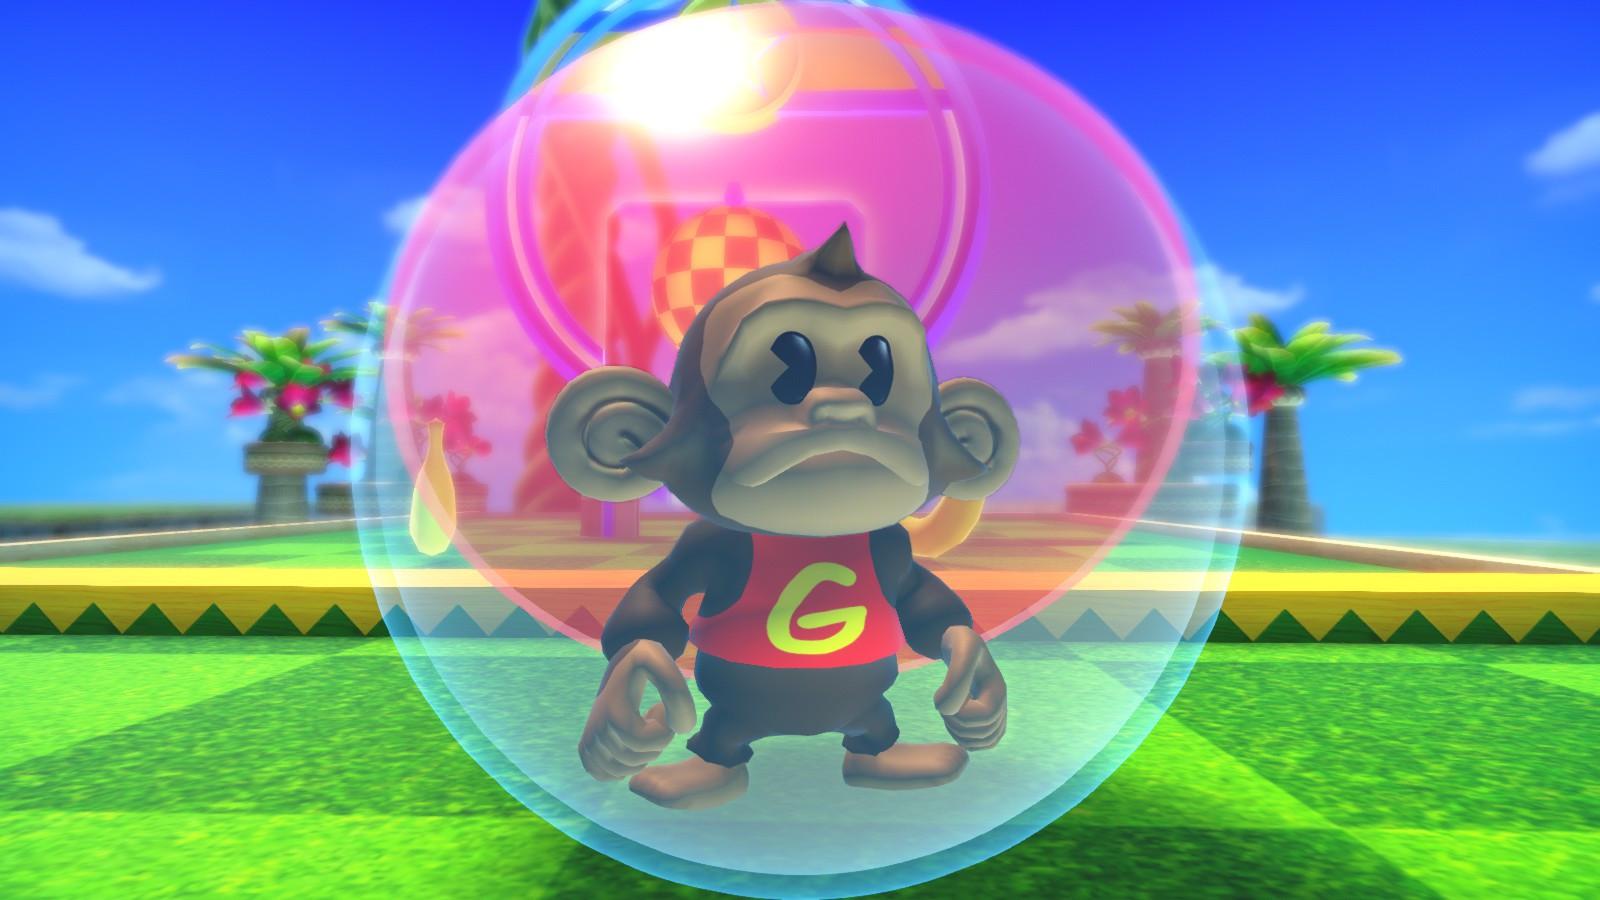 Super Monkey Ball Banana Mania - Game Config Visual Quality Settings - • The Modding Scene [WIP] - F0C9A13